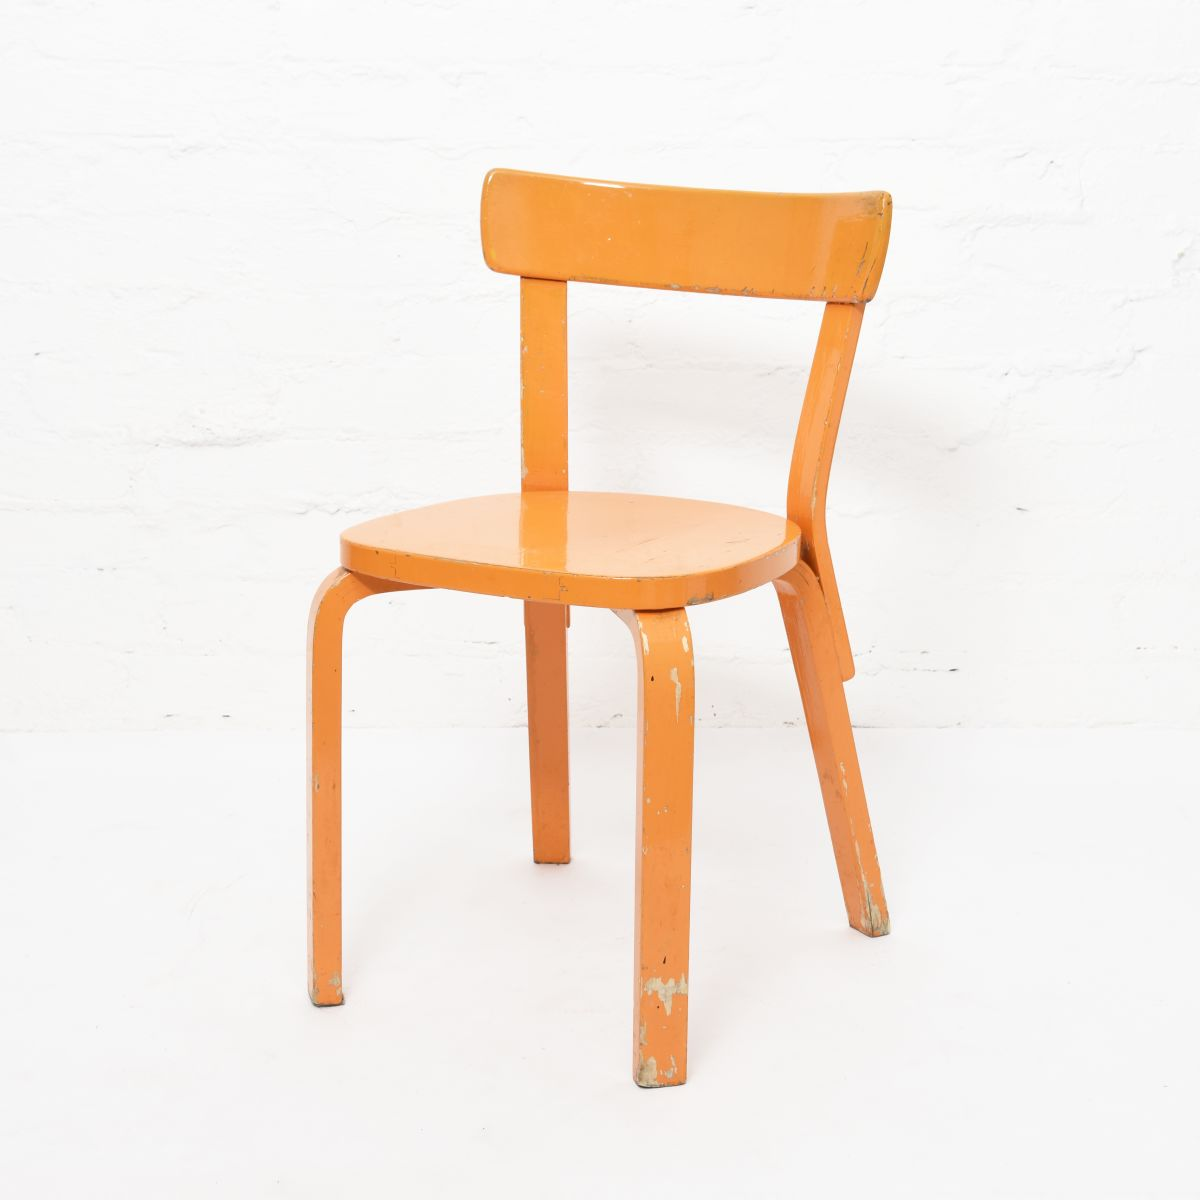 Aalto-Alvar-Chair69-Painted-Blight-Orange